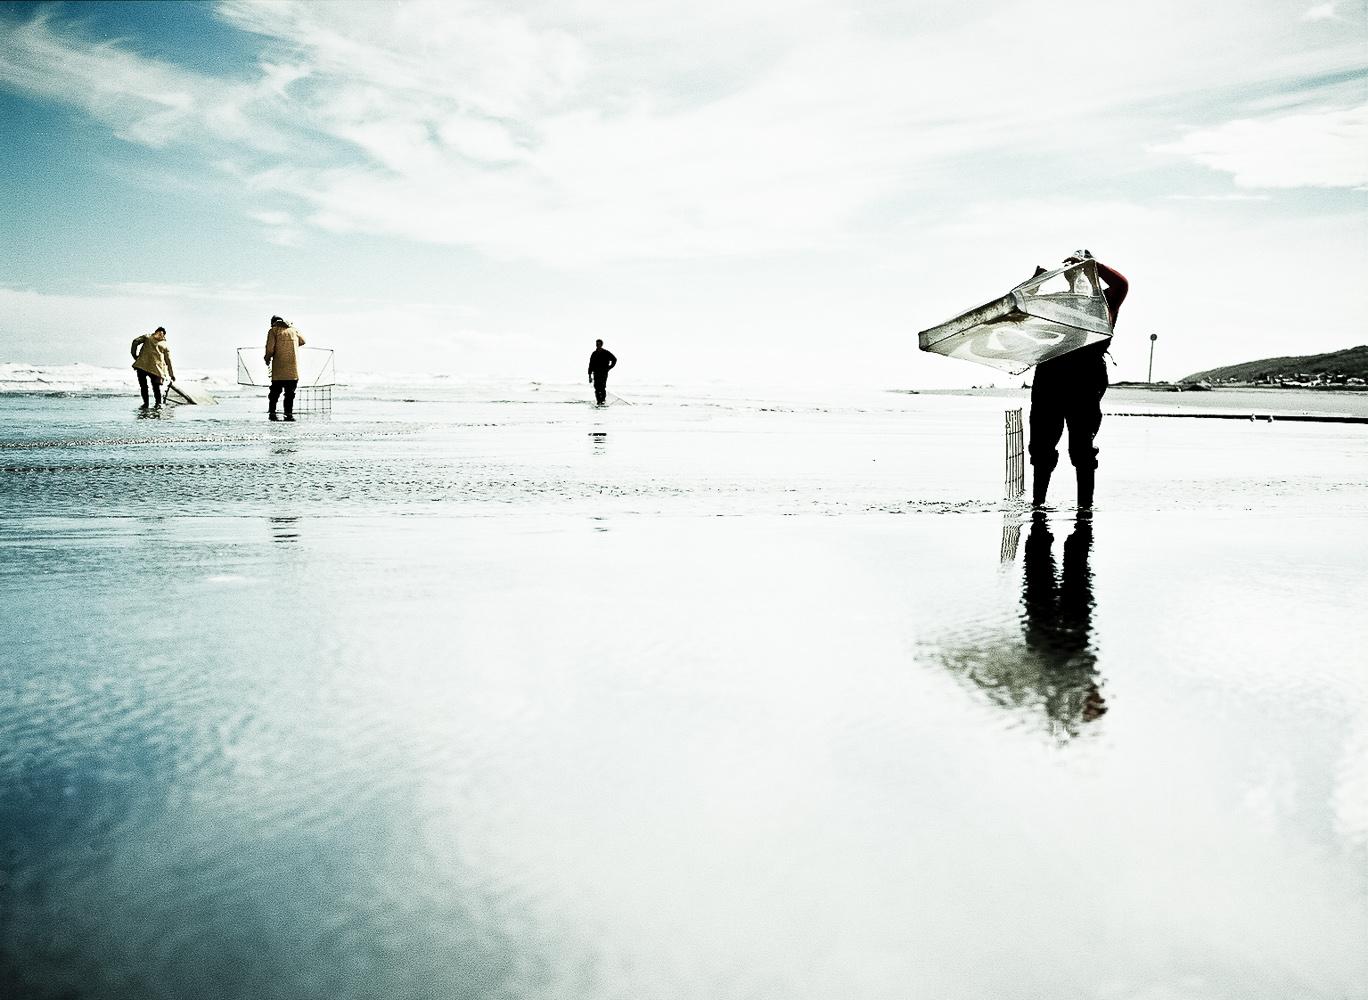 whitebait-man-net-Wellington-photo-Paul-Fisher.jpg